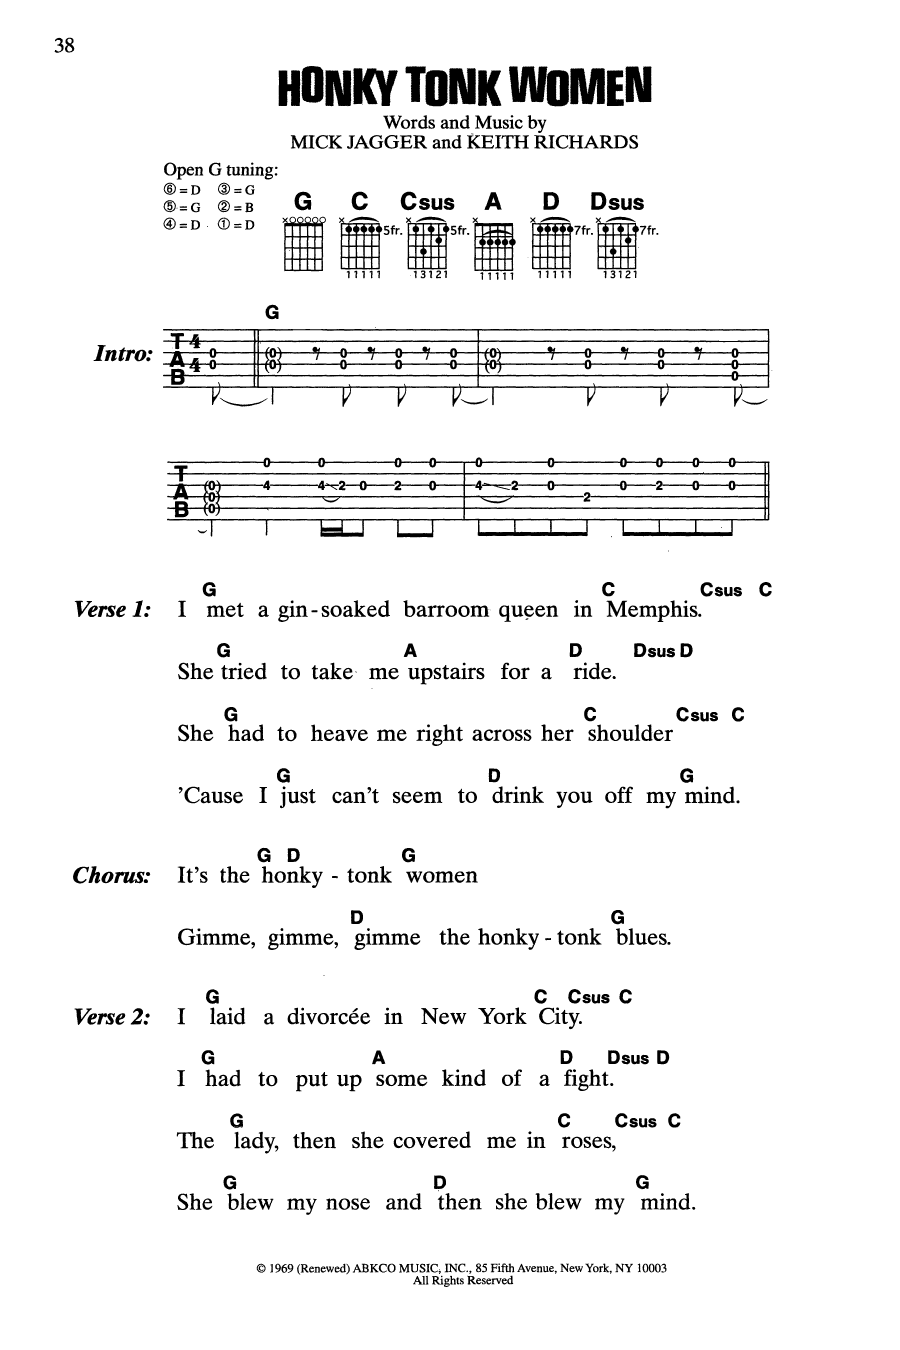 Honky Tonk Women (Guitar Chords/Lyrics)